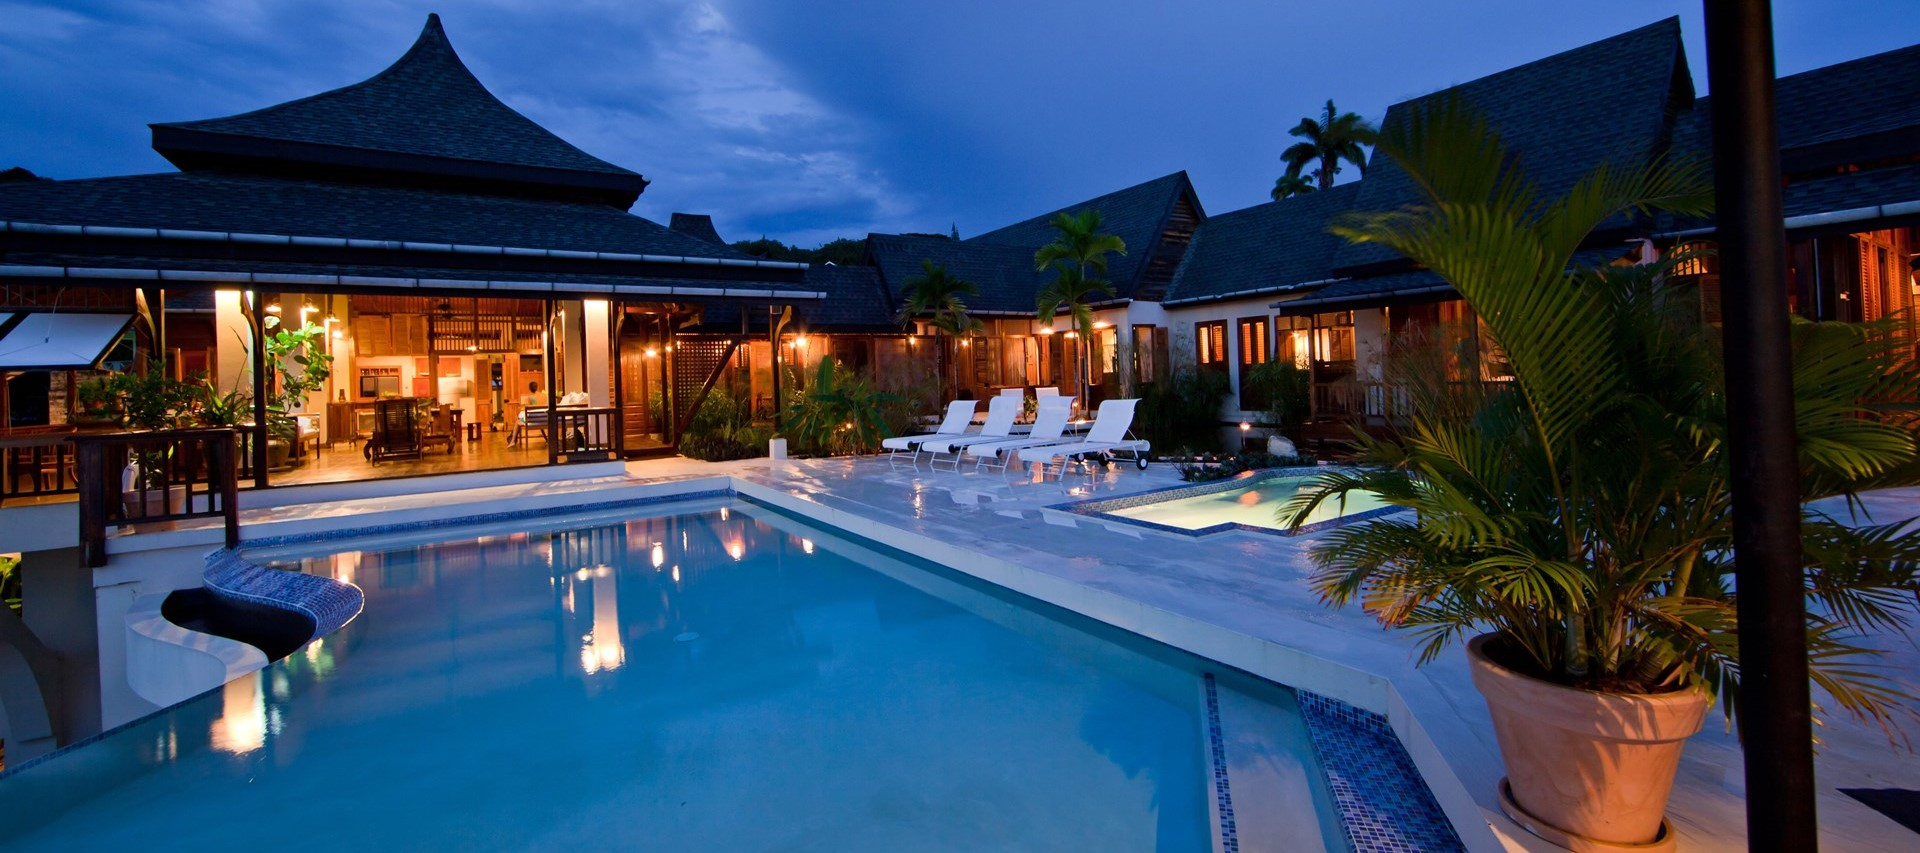 villa-ohana-tobago-pool-terrace-night